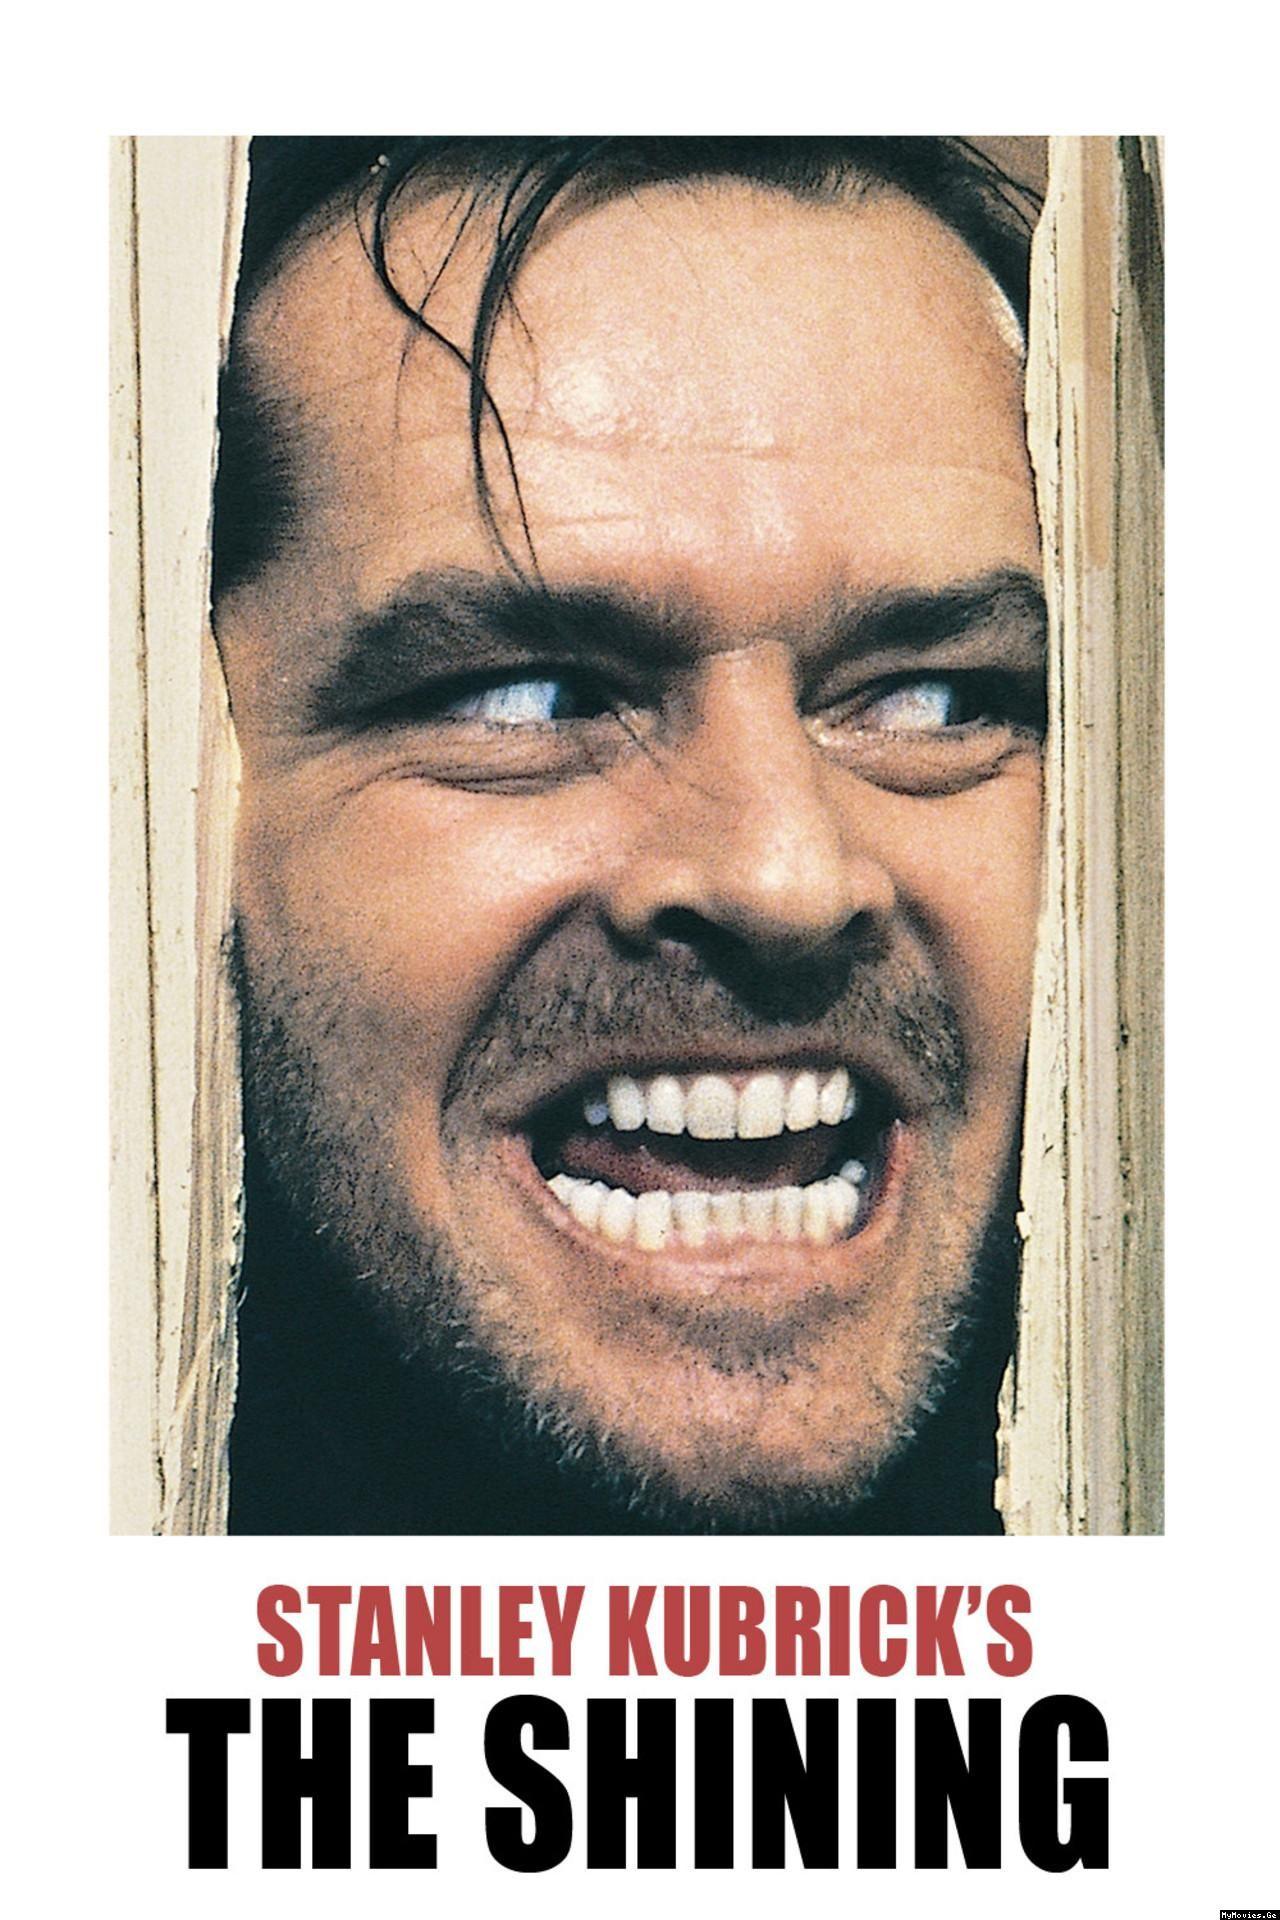 The Shining (Stanley Kubrick) The shining, Best horror